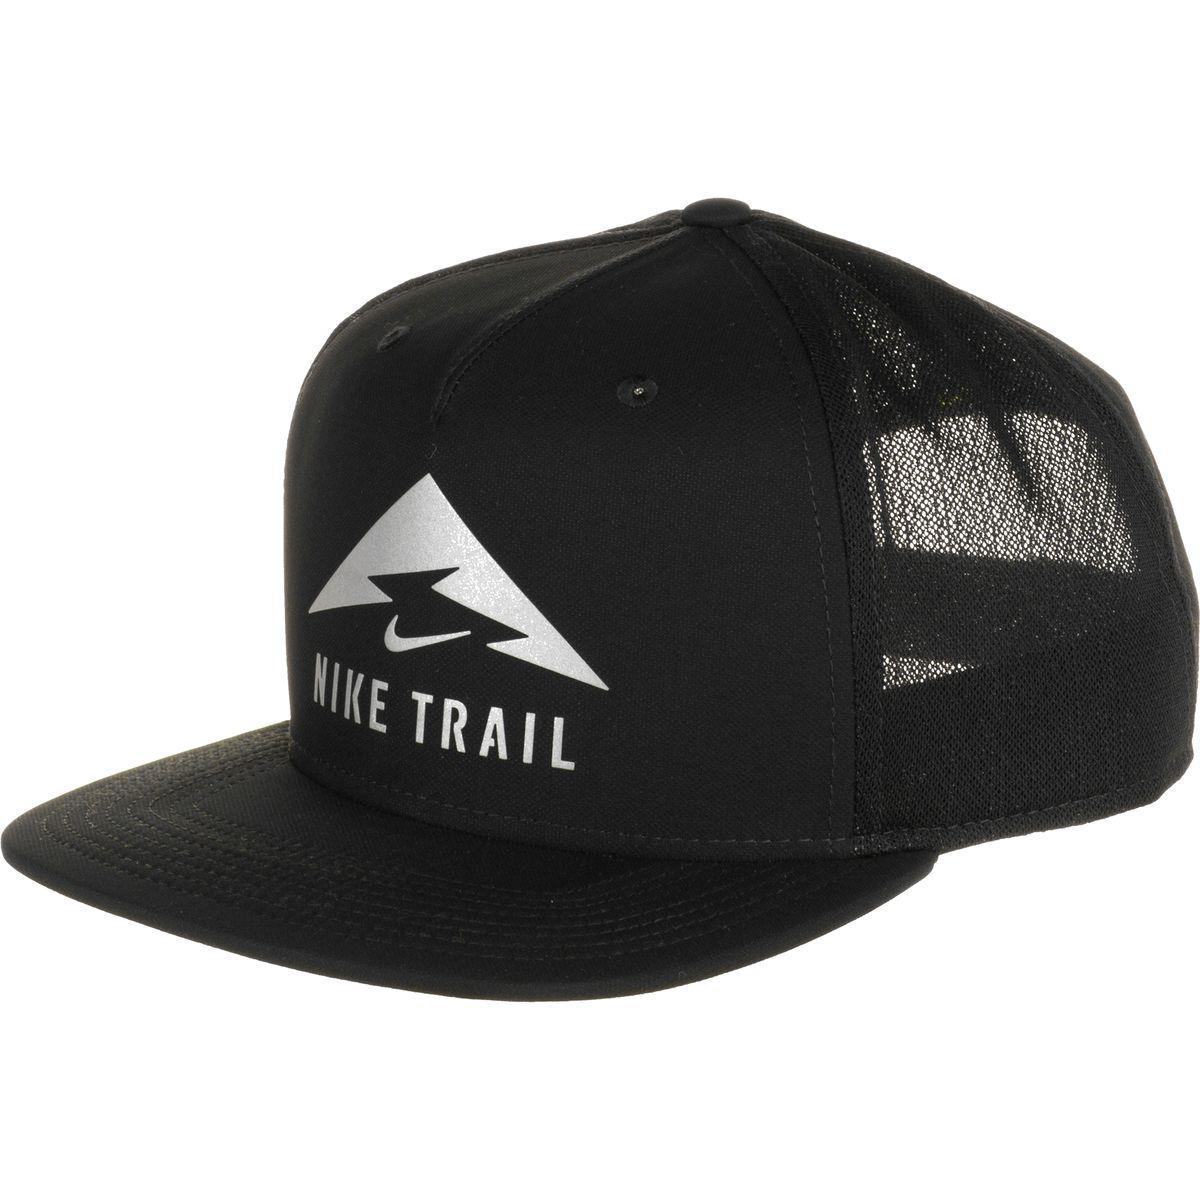 0e98a6a9f62 Lyst - Nike Aerobill Trail Cap in Black for Men